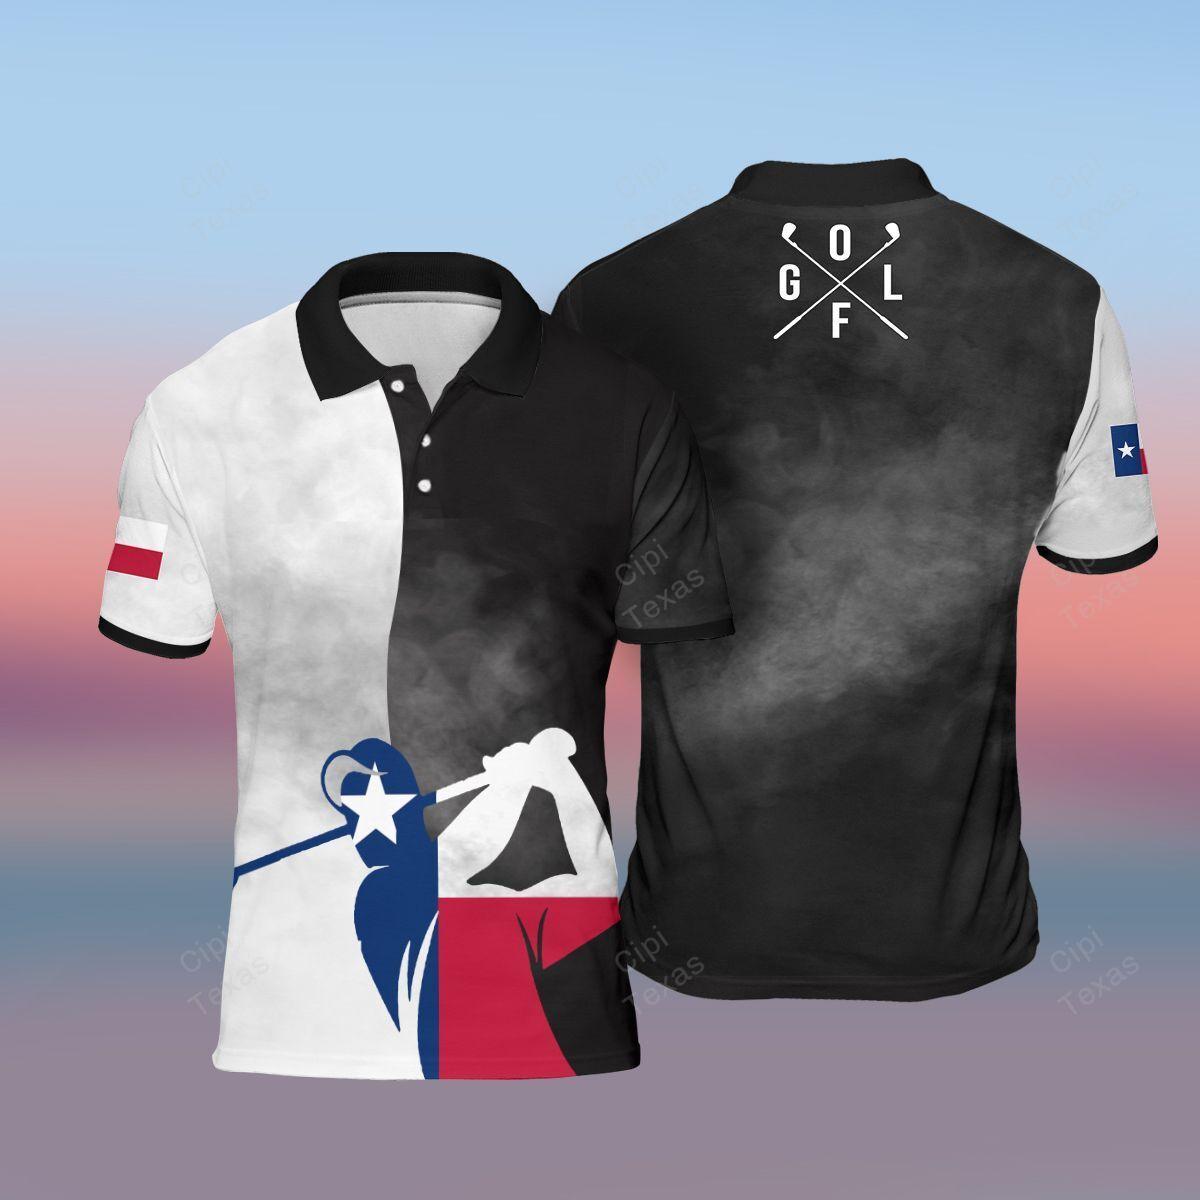 Golfer Golf Player Texas Flag Black Polo Shirt